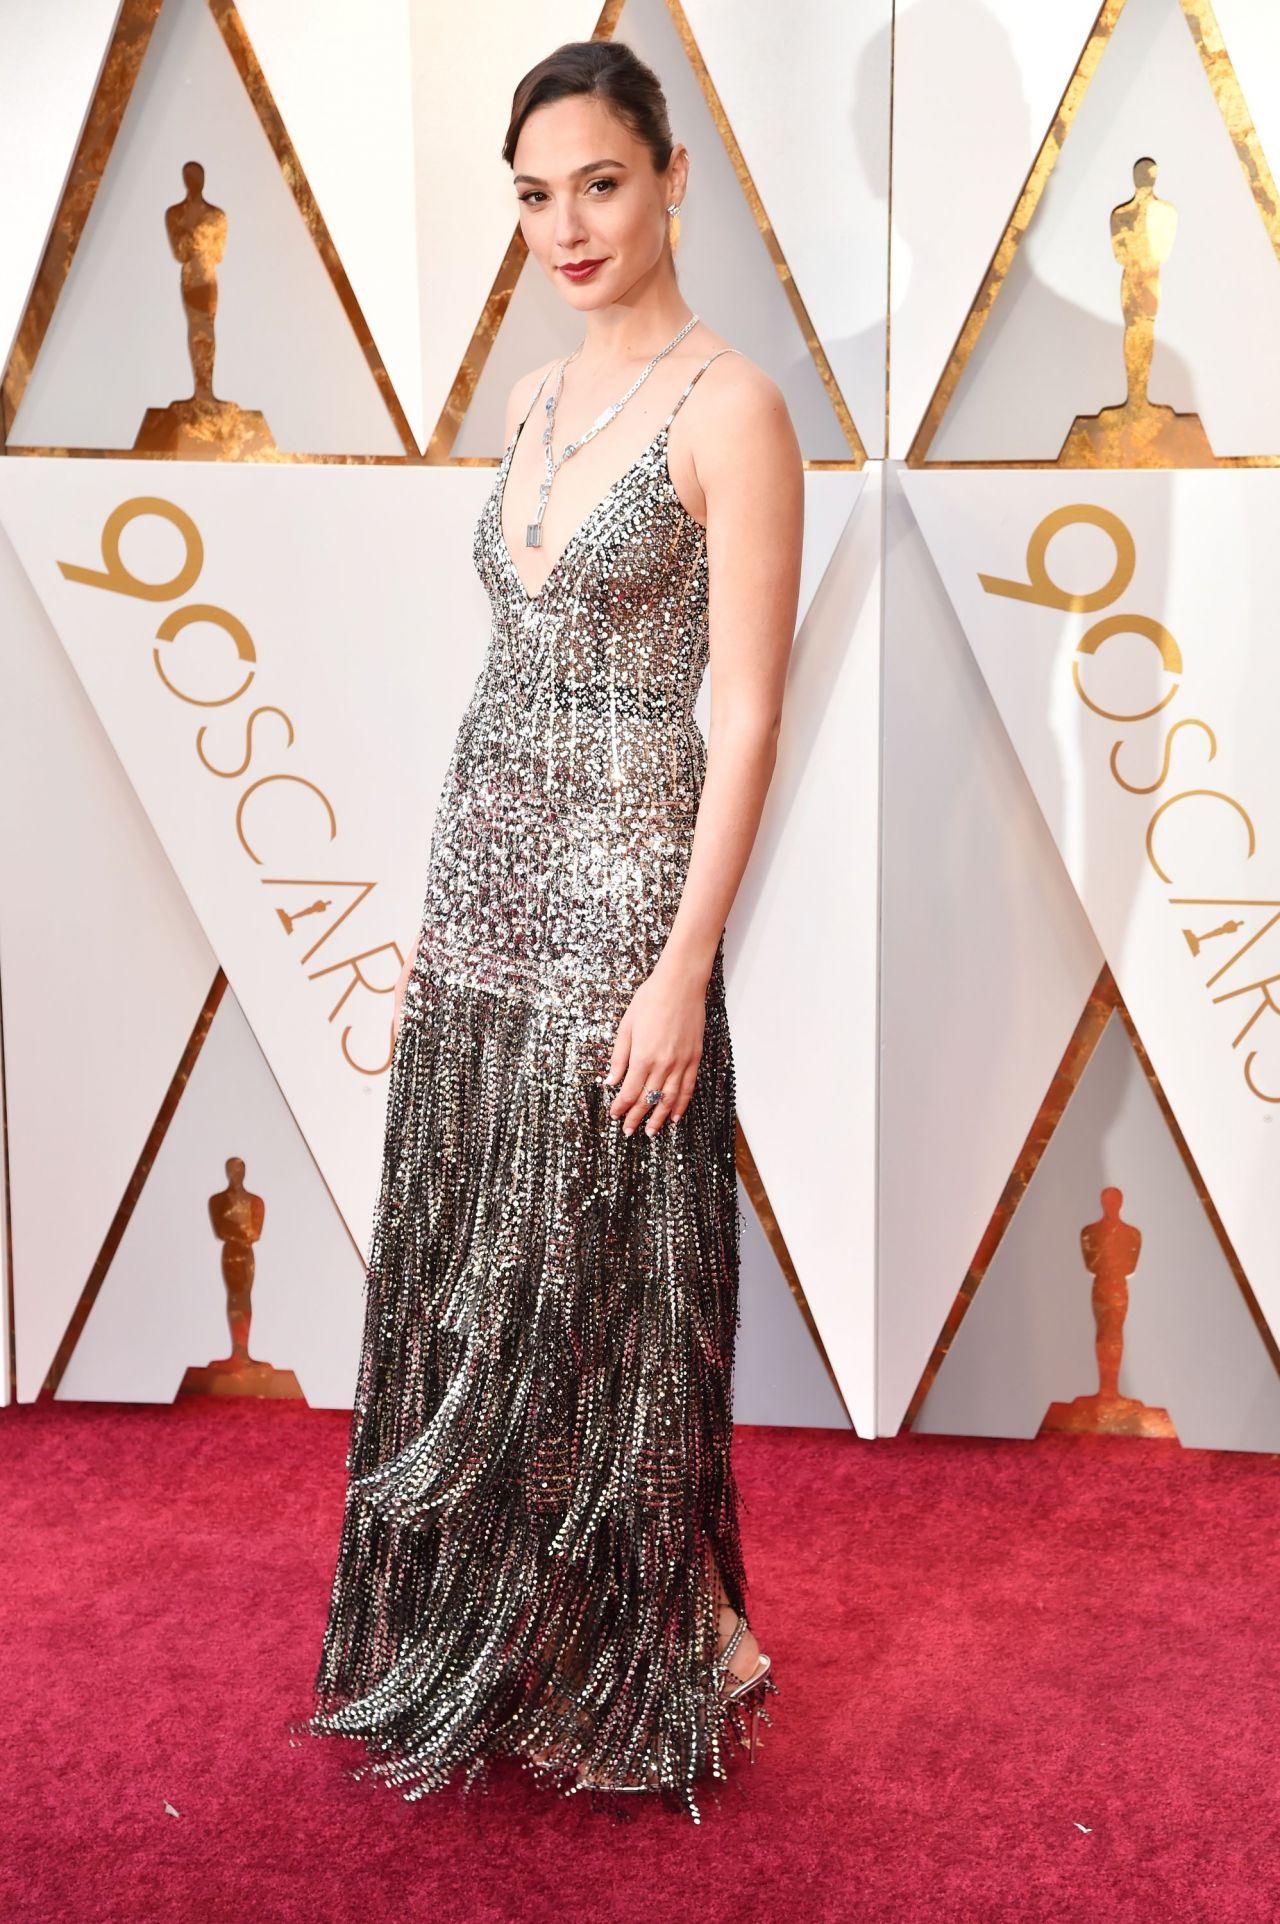 Gal Gadot Oscars 2018 Red Carpet